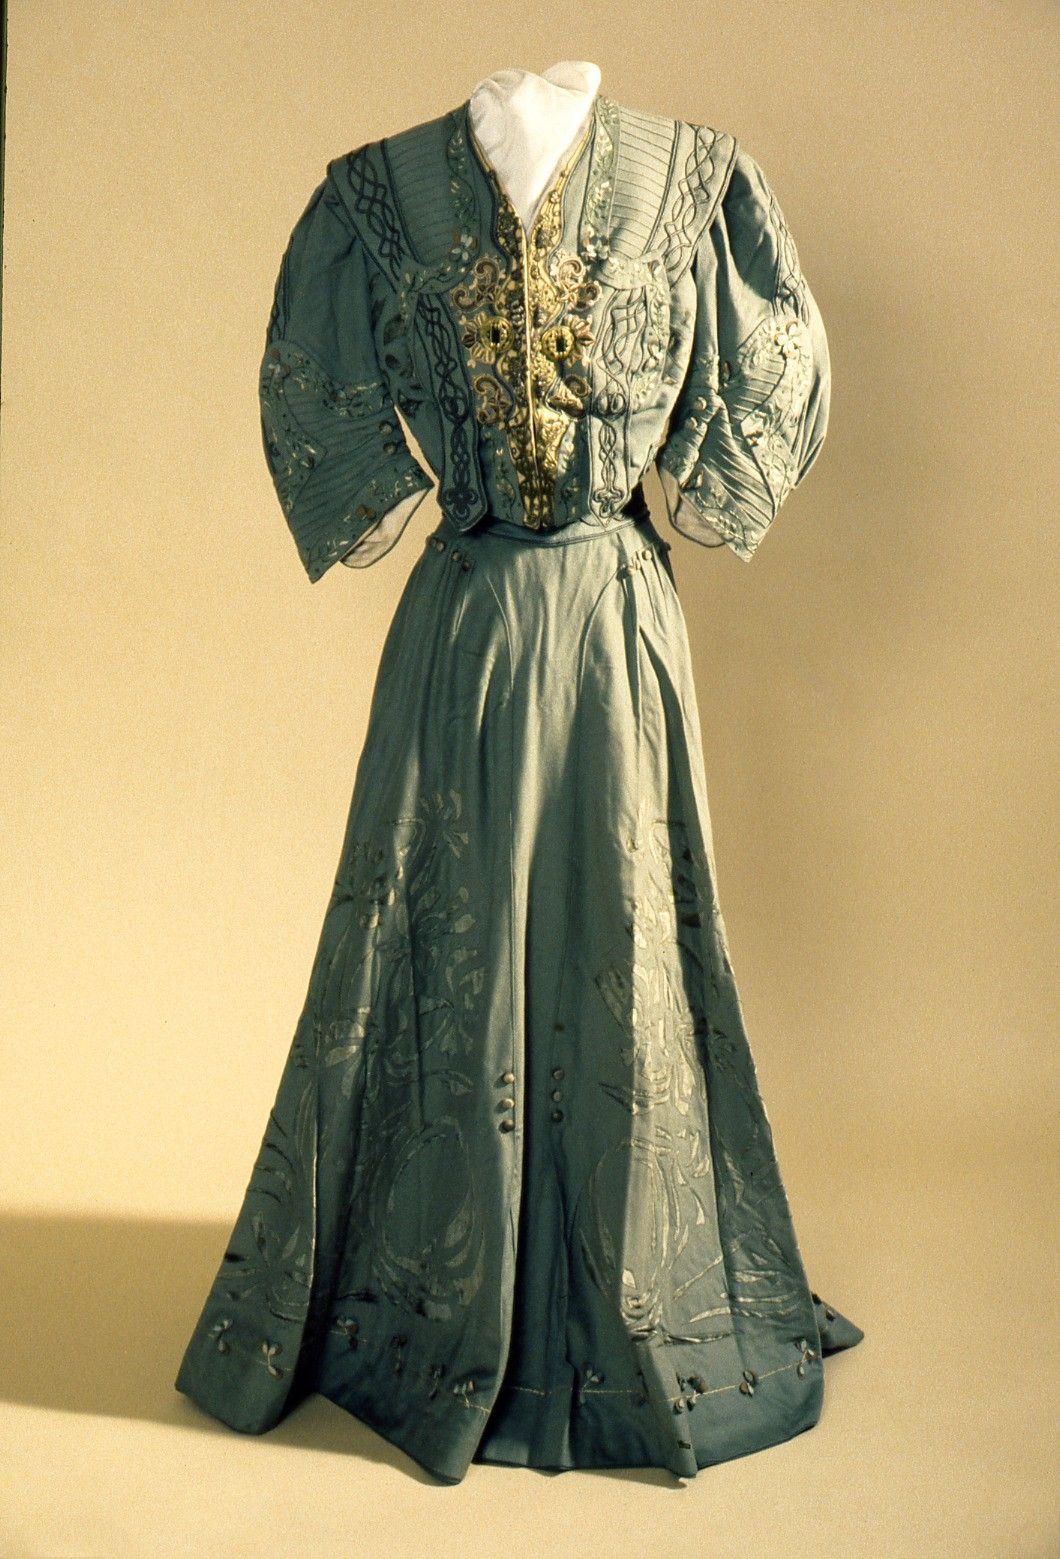 1903, America - Skirtsuit by L.S. Ayres and Co. - Wool, braid, velvet, silk, taffeta